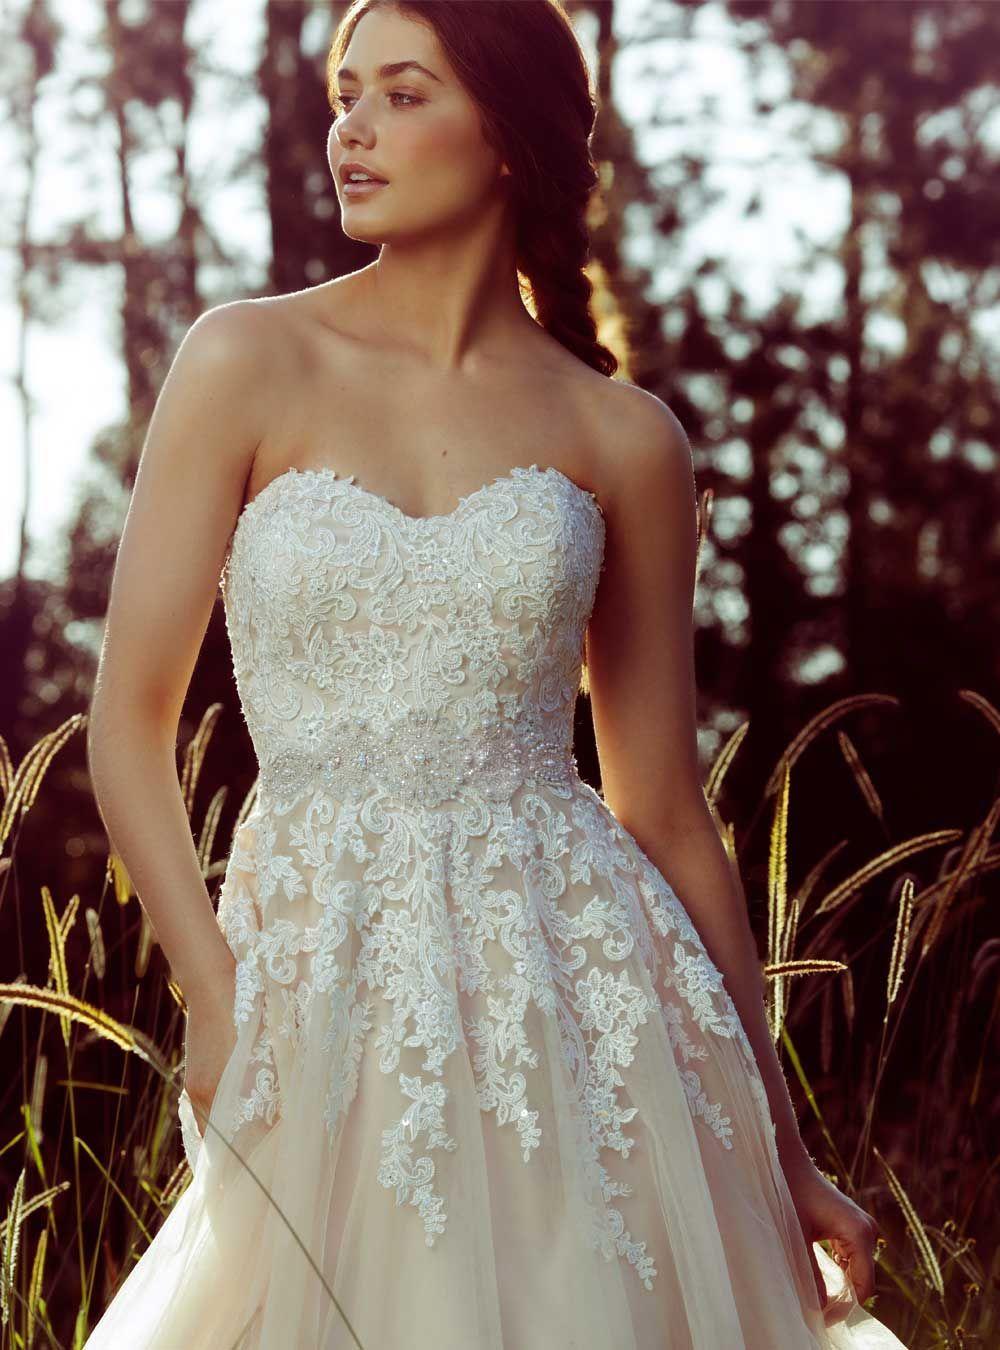 Carris Wedding Dress | Gowns, Wedding dress and Beach weddings